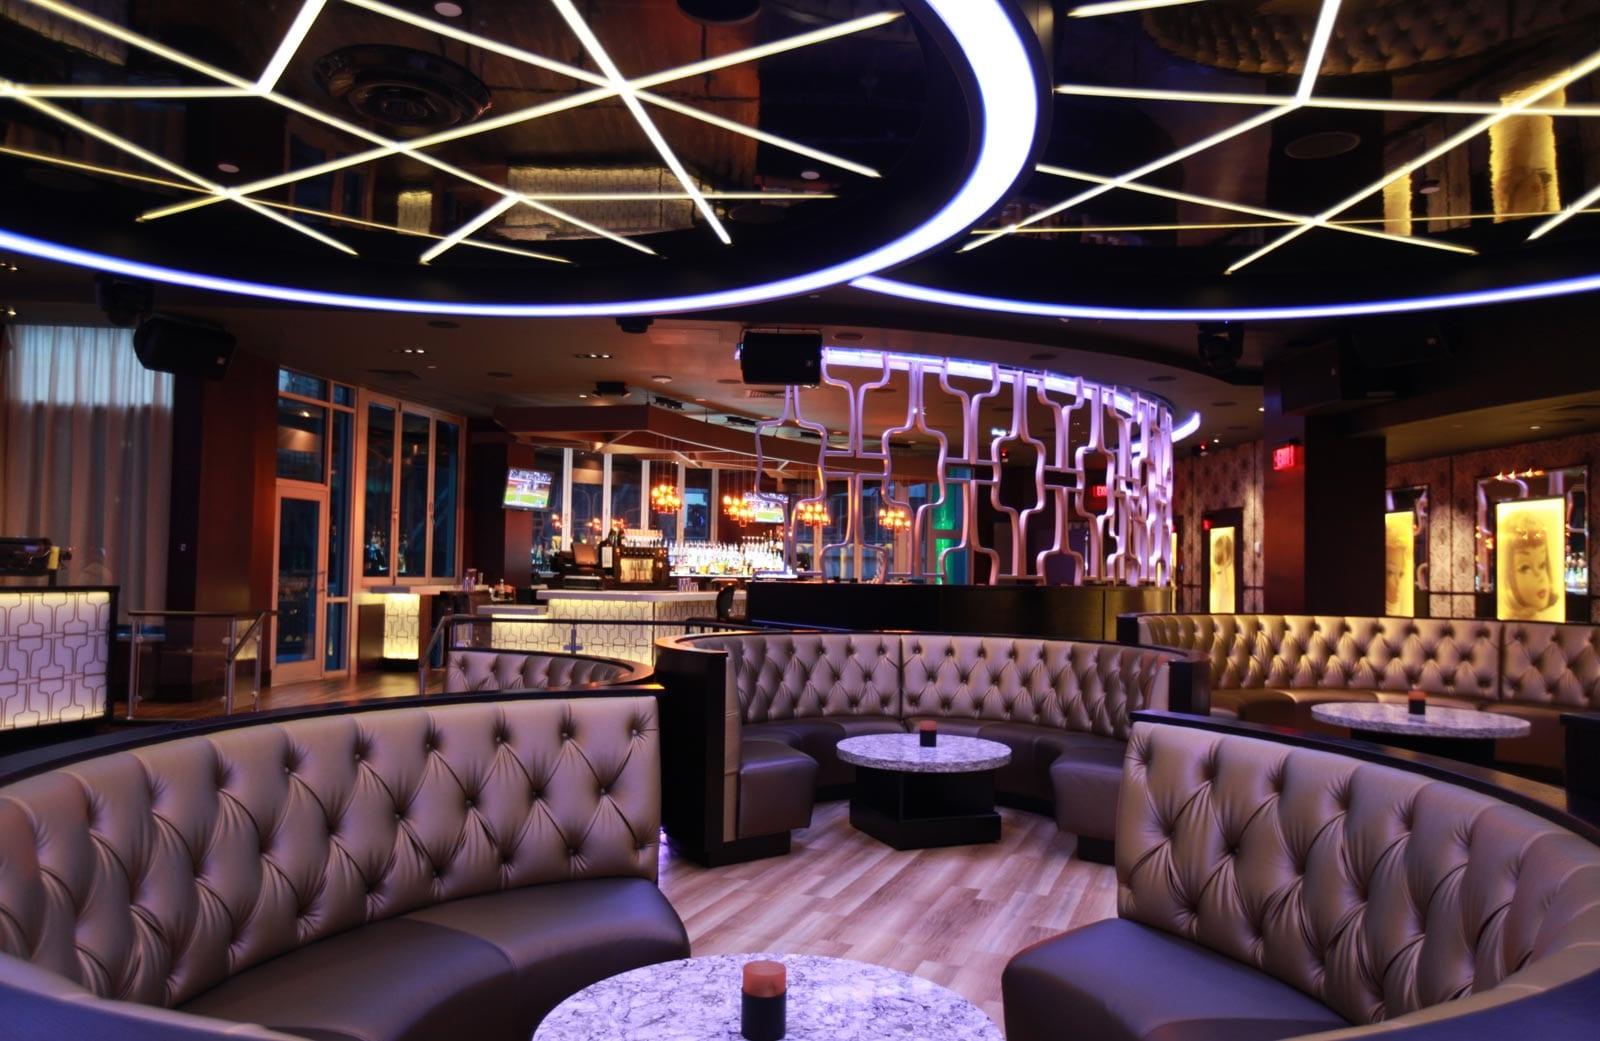 Bubble - Hotel, Restaurant & Nightclub Design by Big Time ...